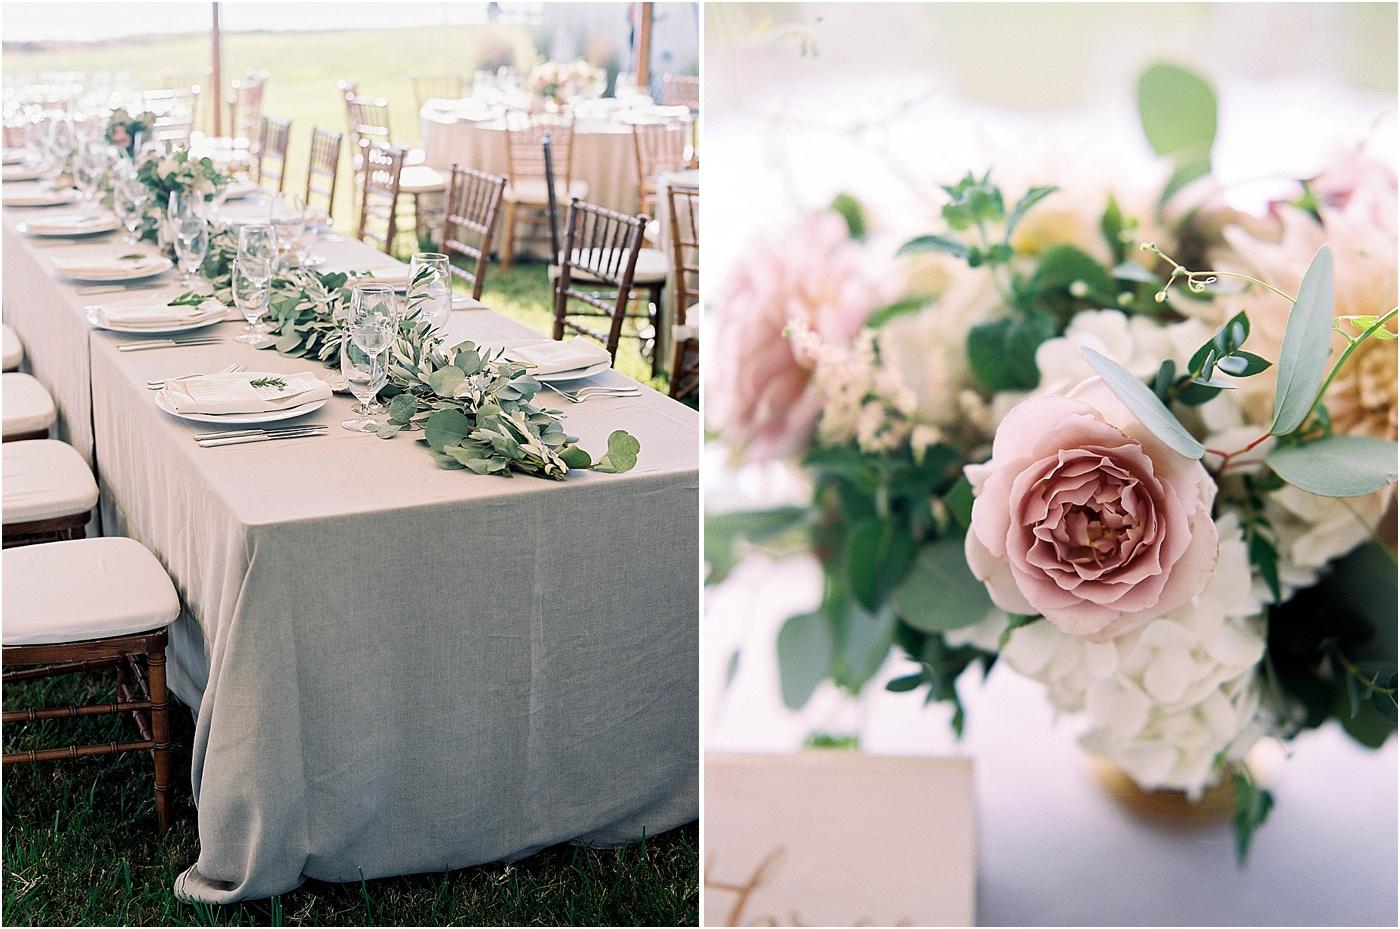 greenery rustic table setting wedding